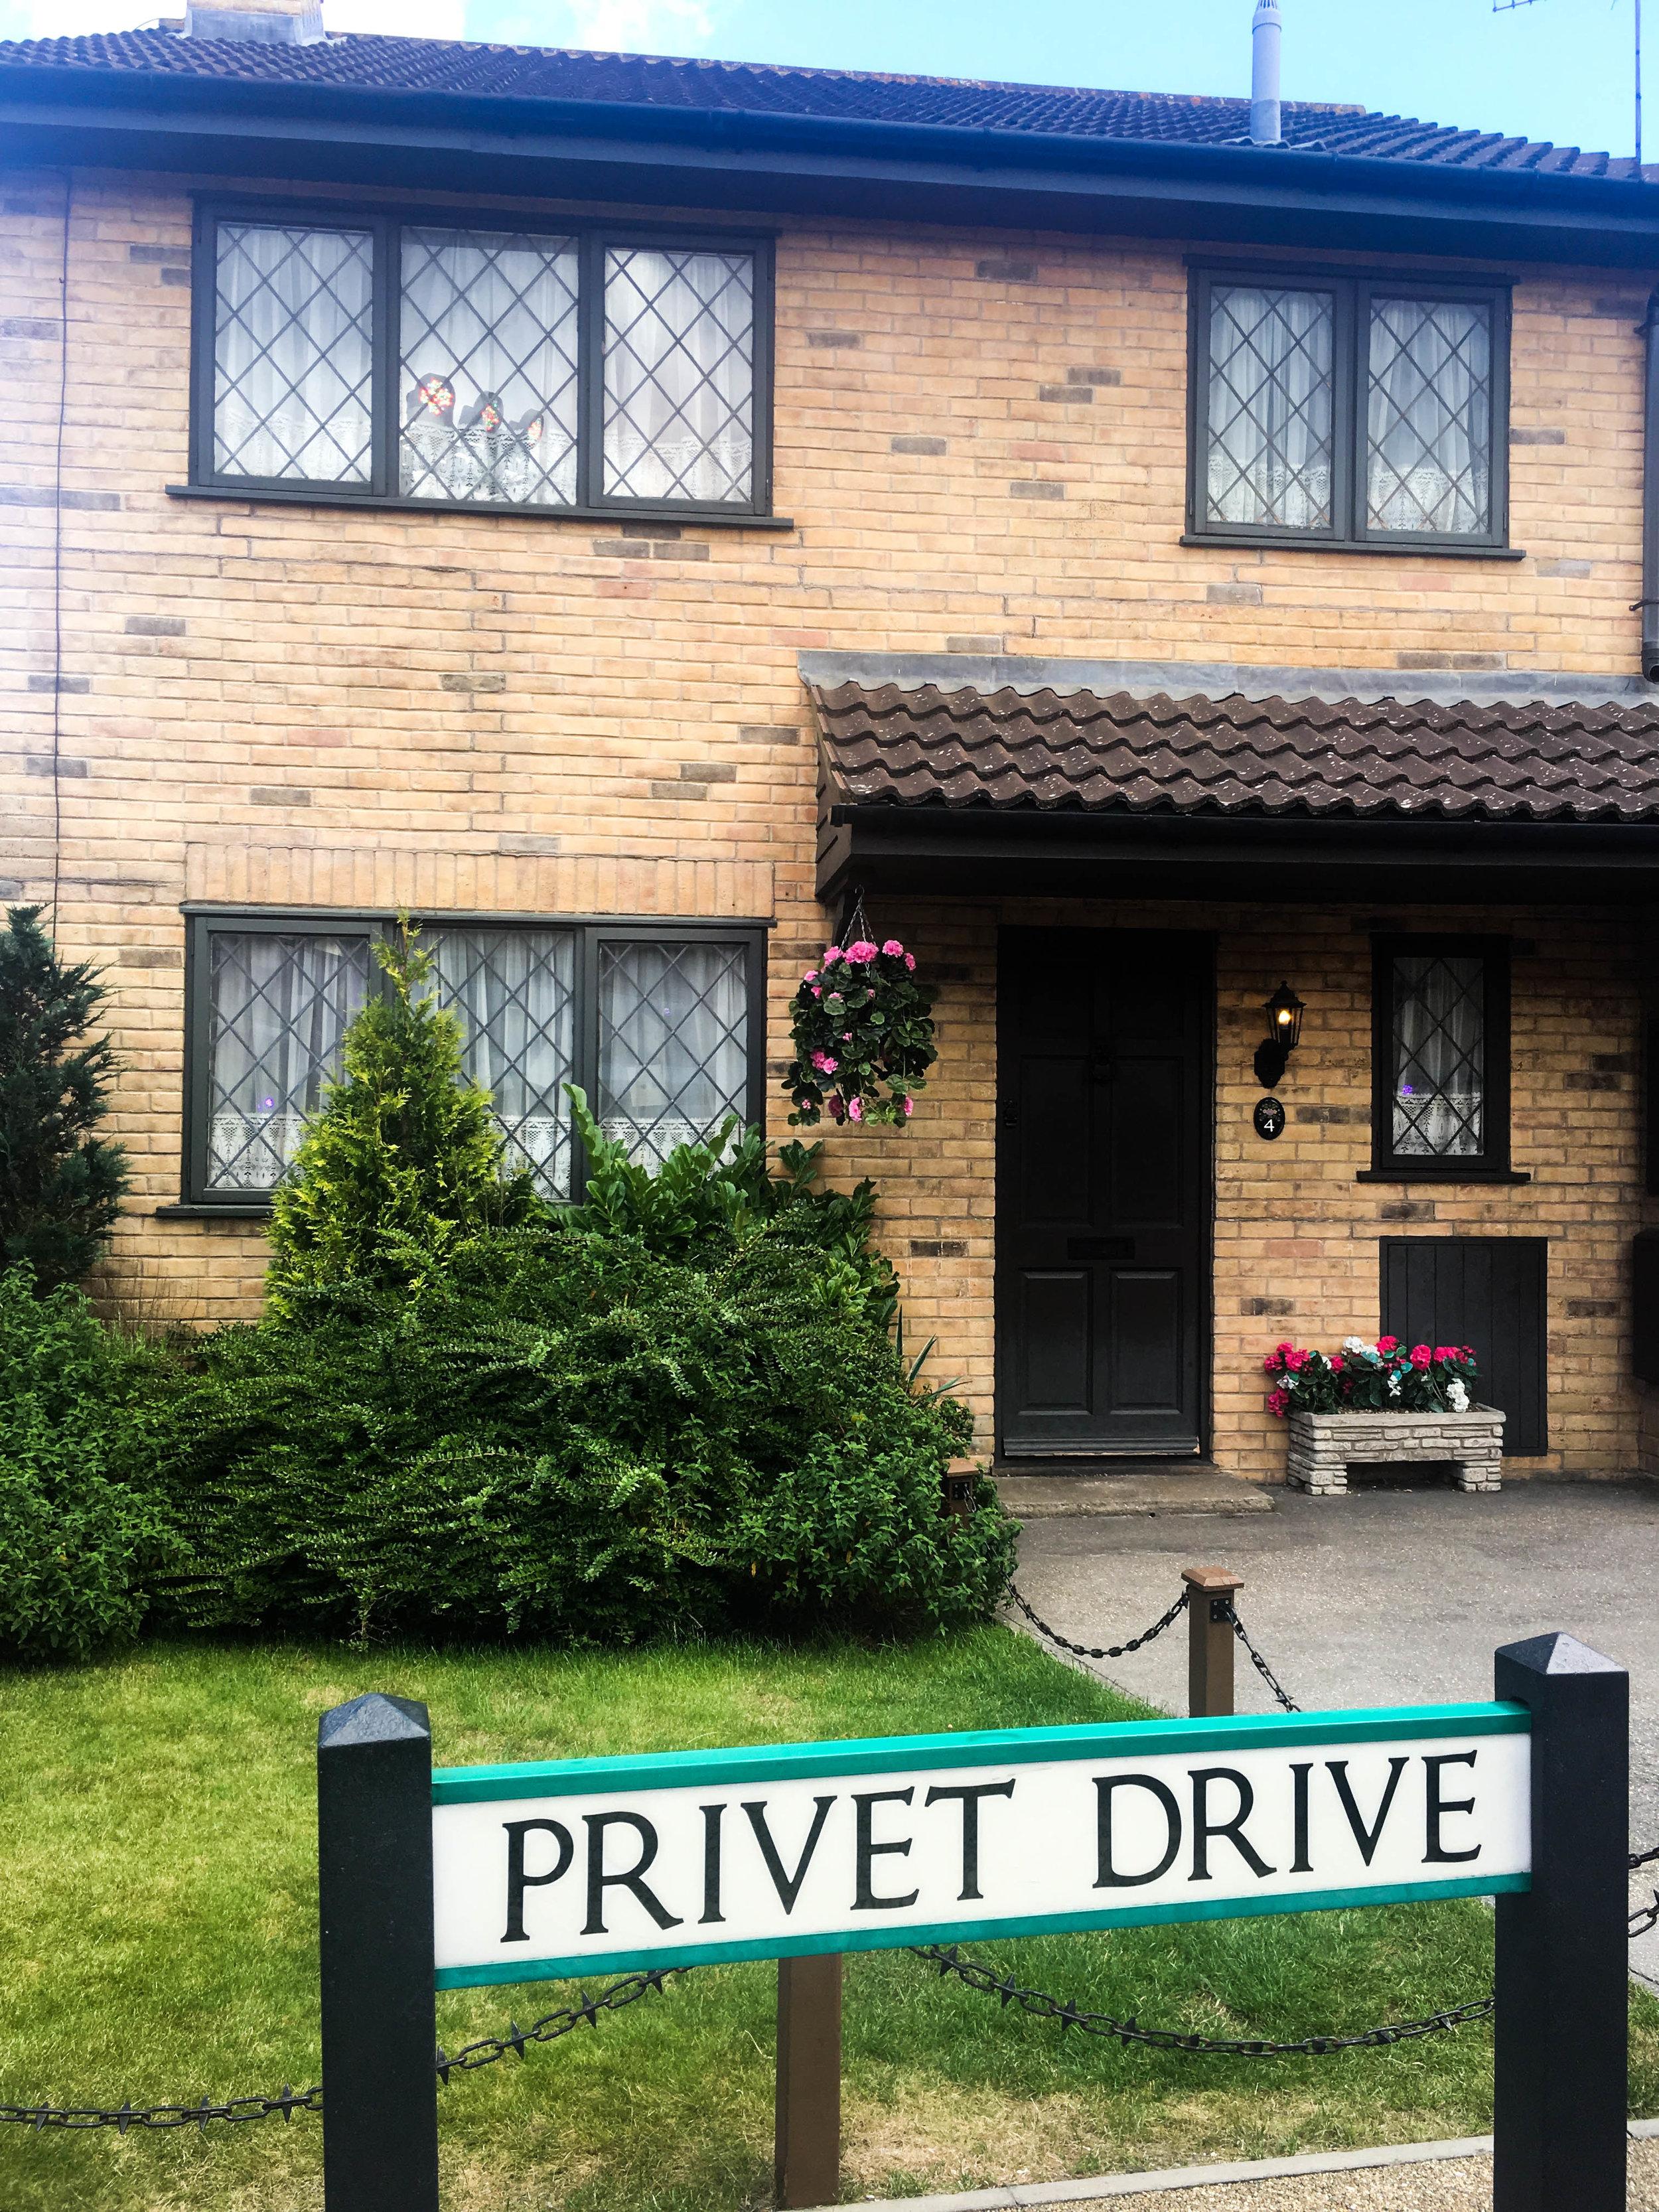 Privet Drive Harry Potter.jpg